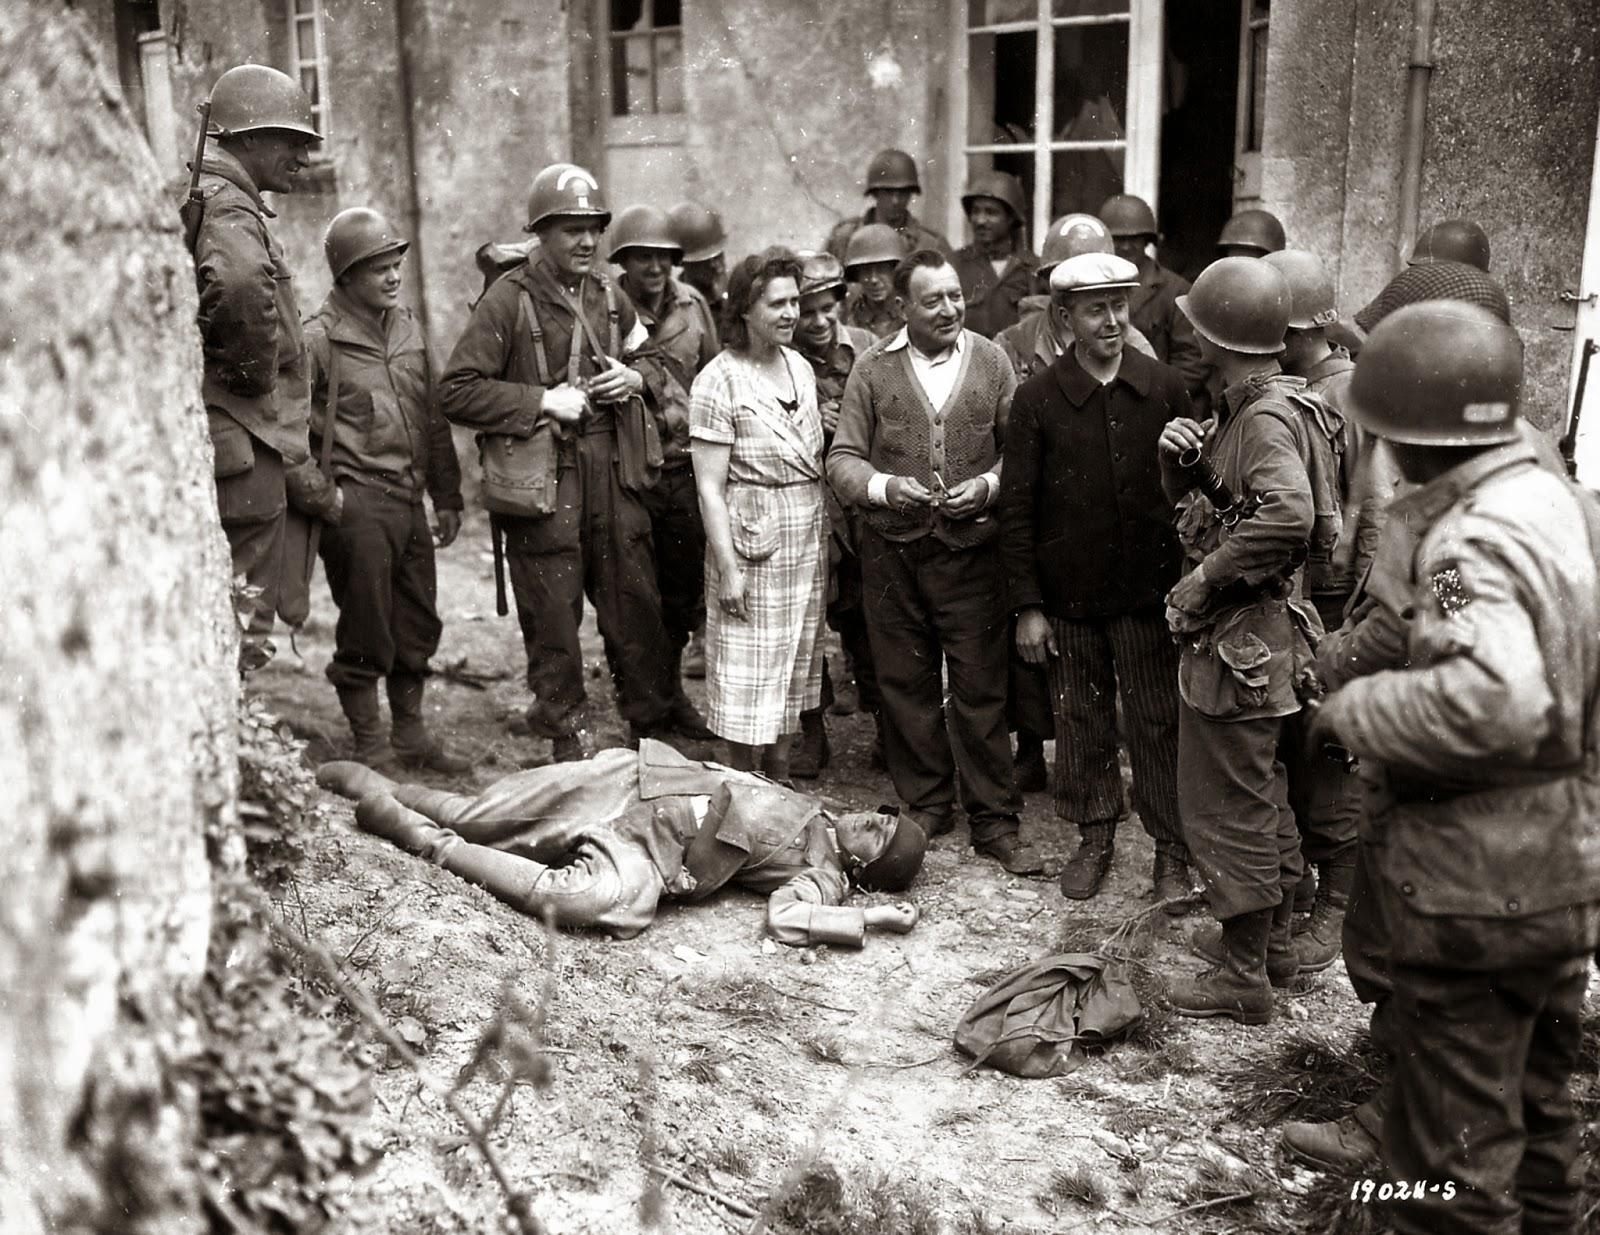 NAZI JERMAN: Foto Terkenal Perang Dunia II